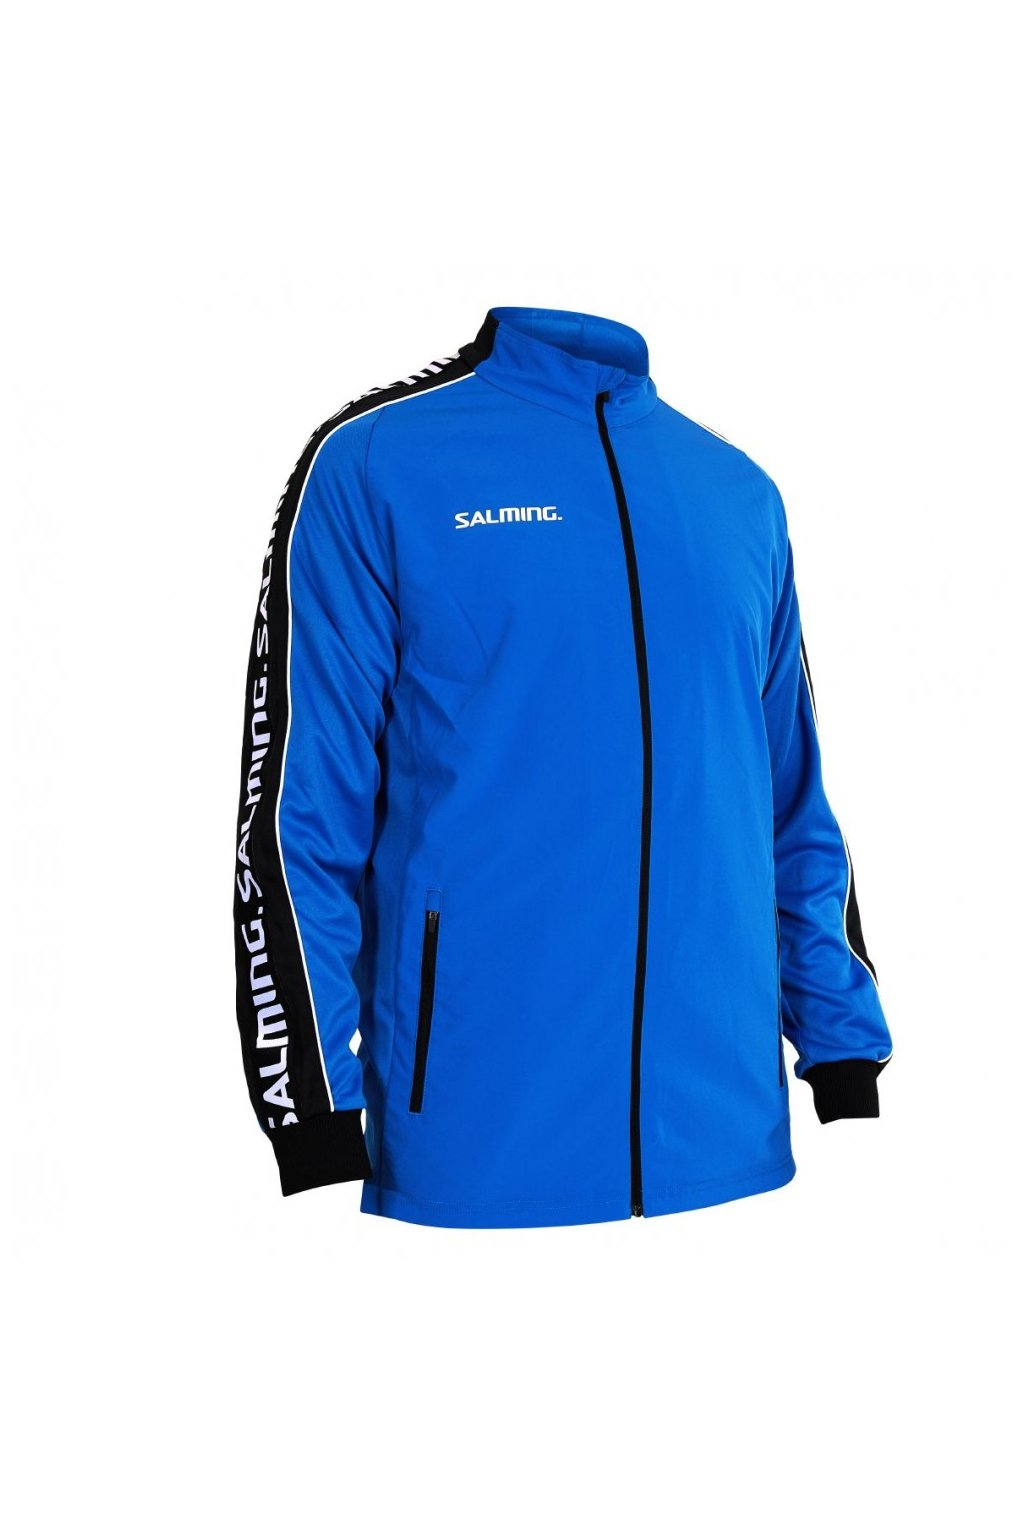 salming delta jacket men (2)